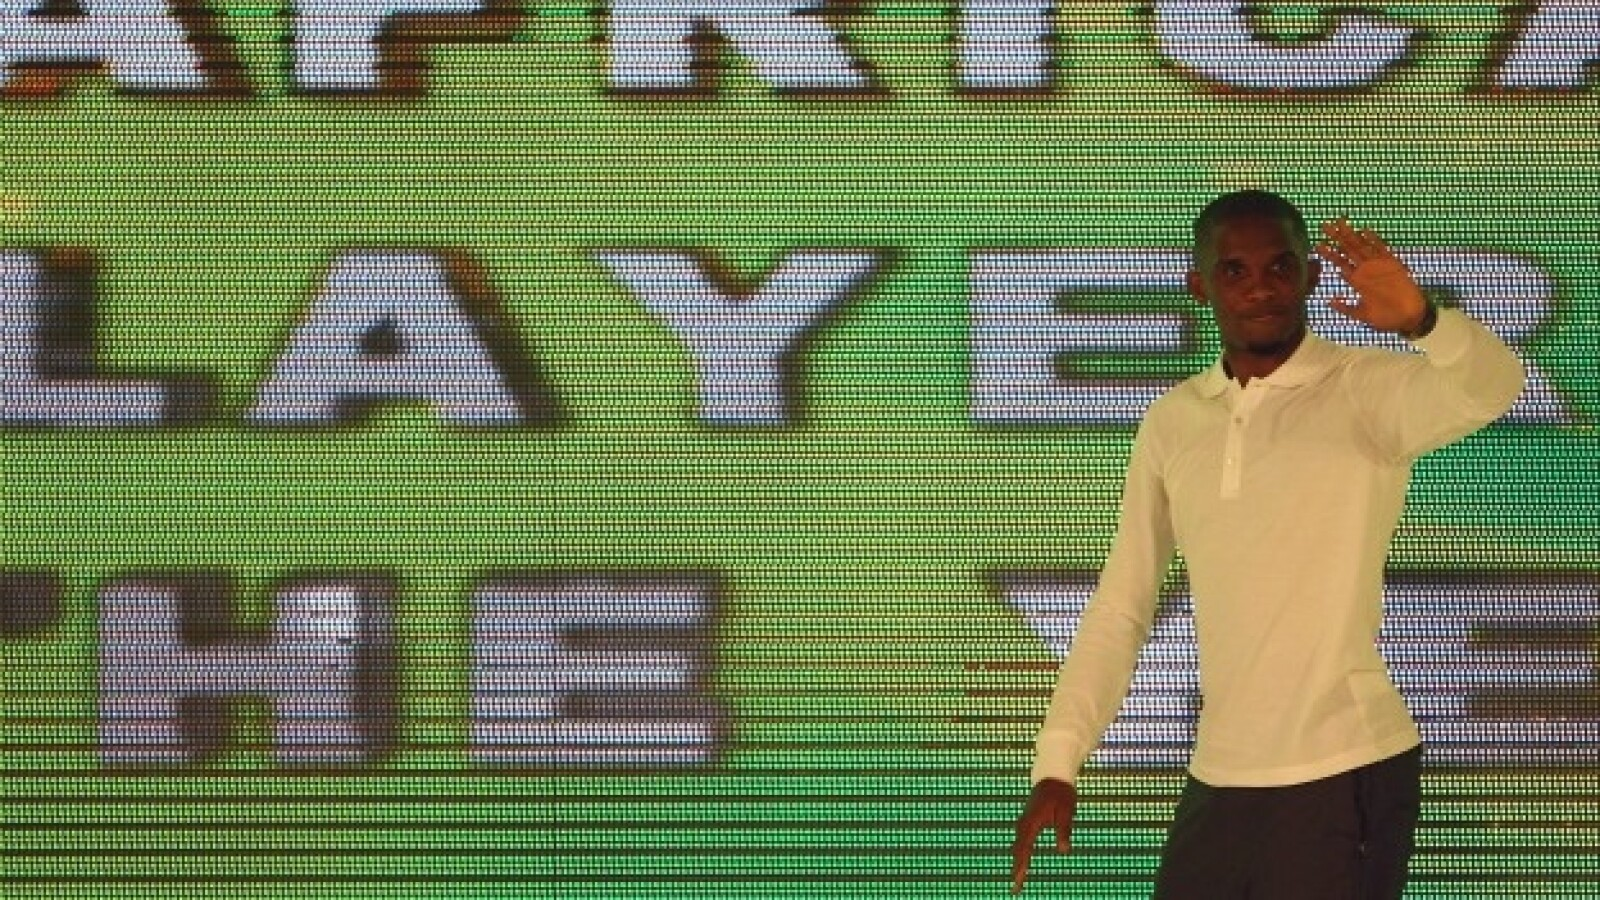 Samuel Eto'o es nombrado por cuarta vez mejor futbolista africano